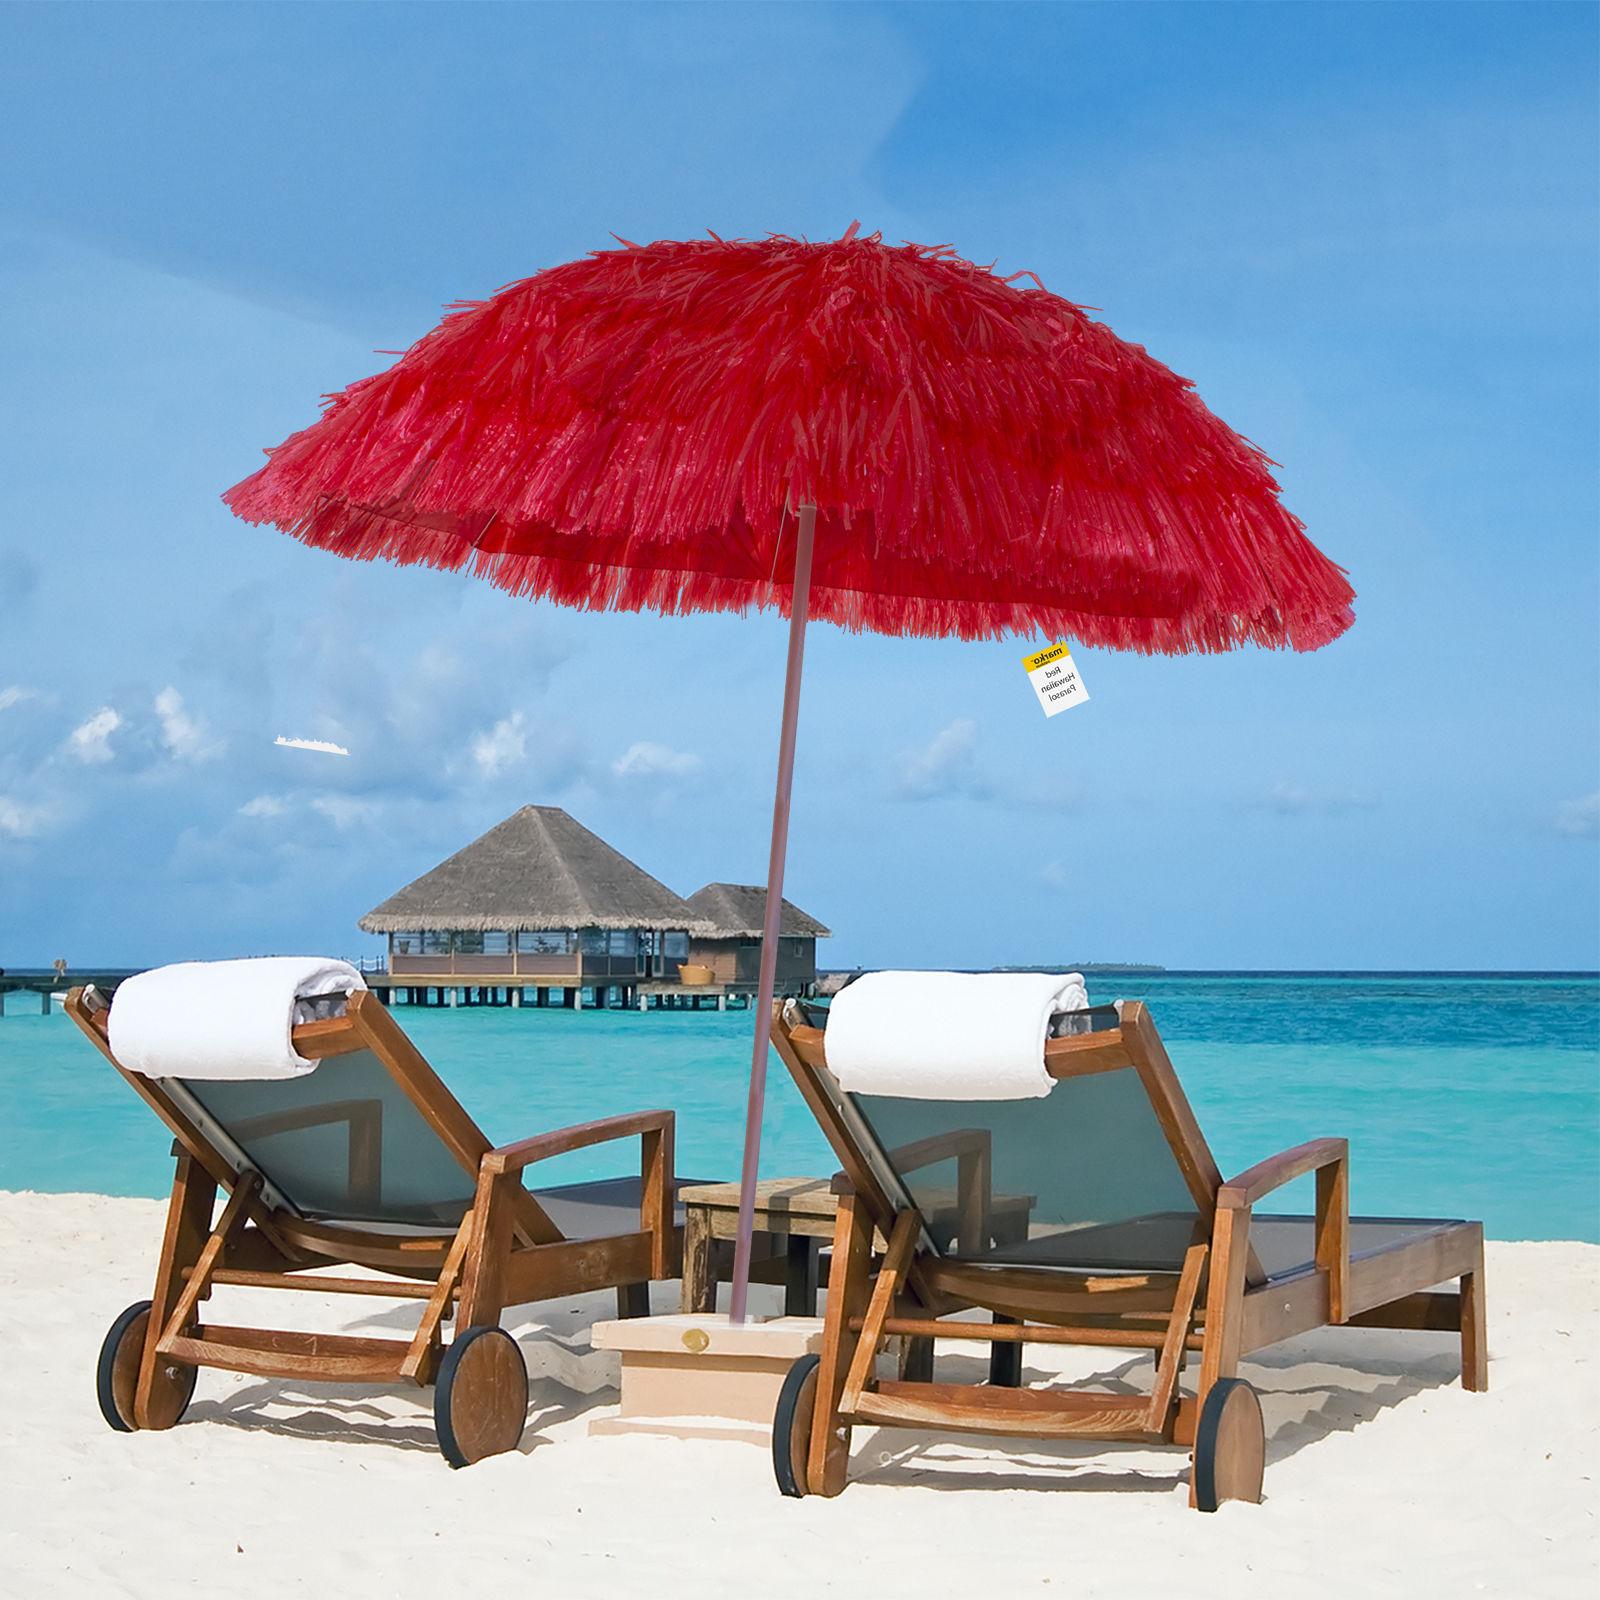 Fashionable Details About Outdoor Hawaiian Parasol Beach Umbrella Tilt Sun Shade Hawaii Style Patio Garden Regarding Tilt Beach Umbrellas (View 15 of 20)